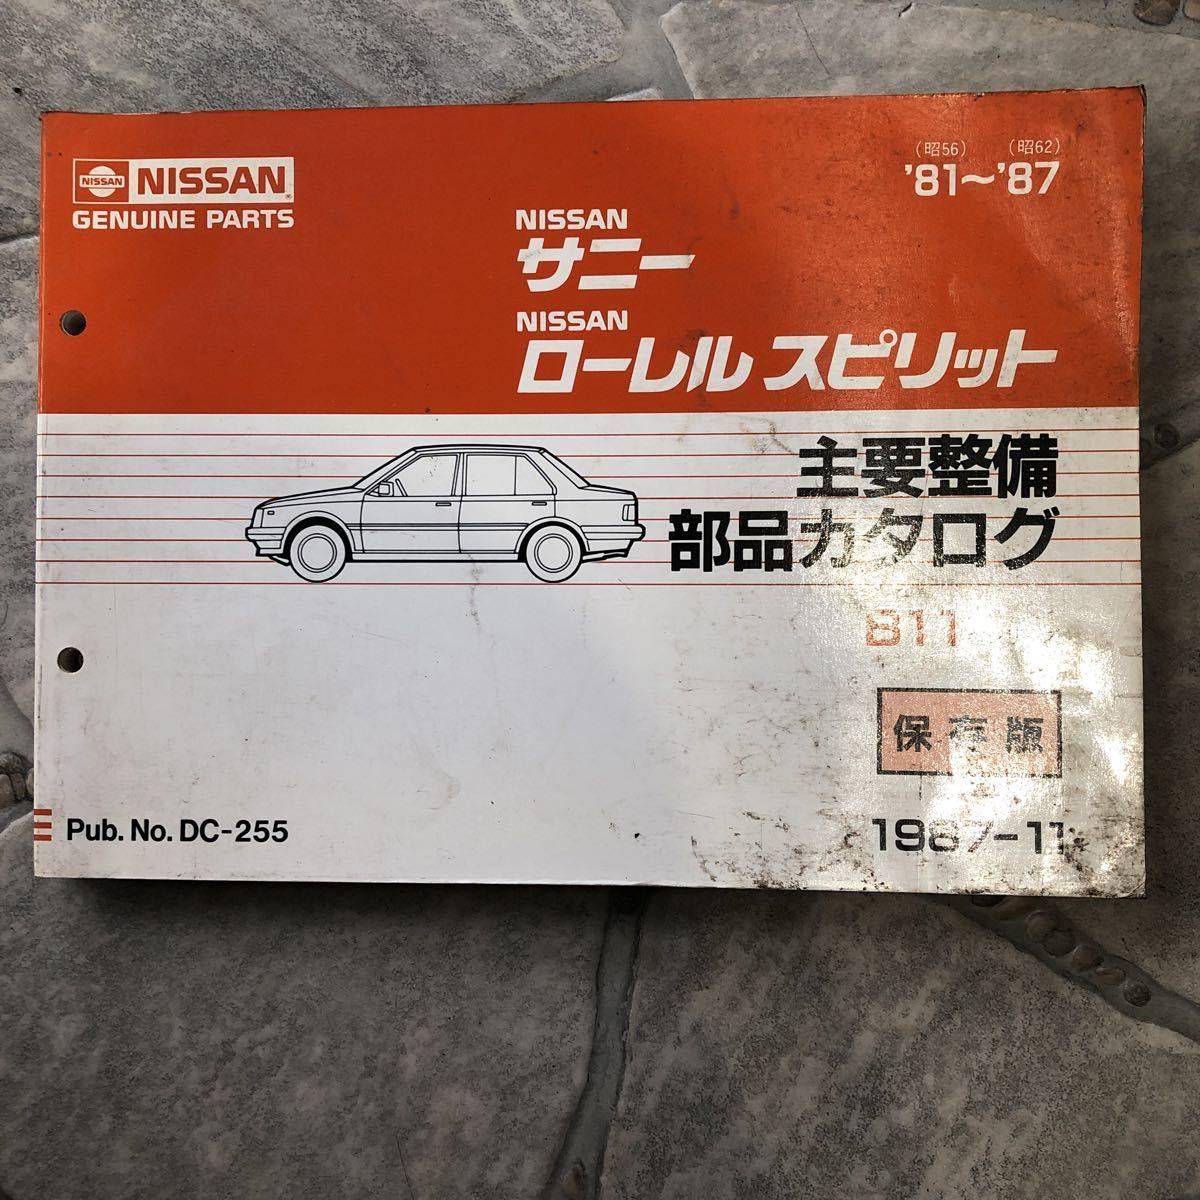 Nissan Sunny B11 type series 81~87 used main maintenance parts